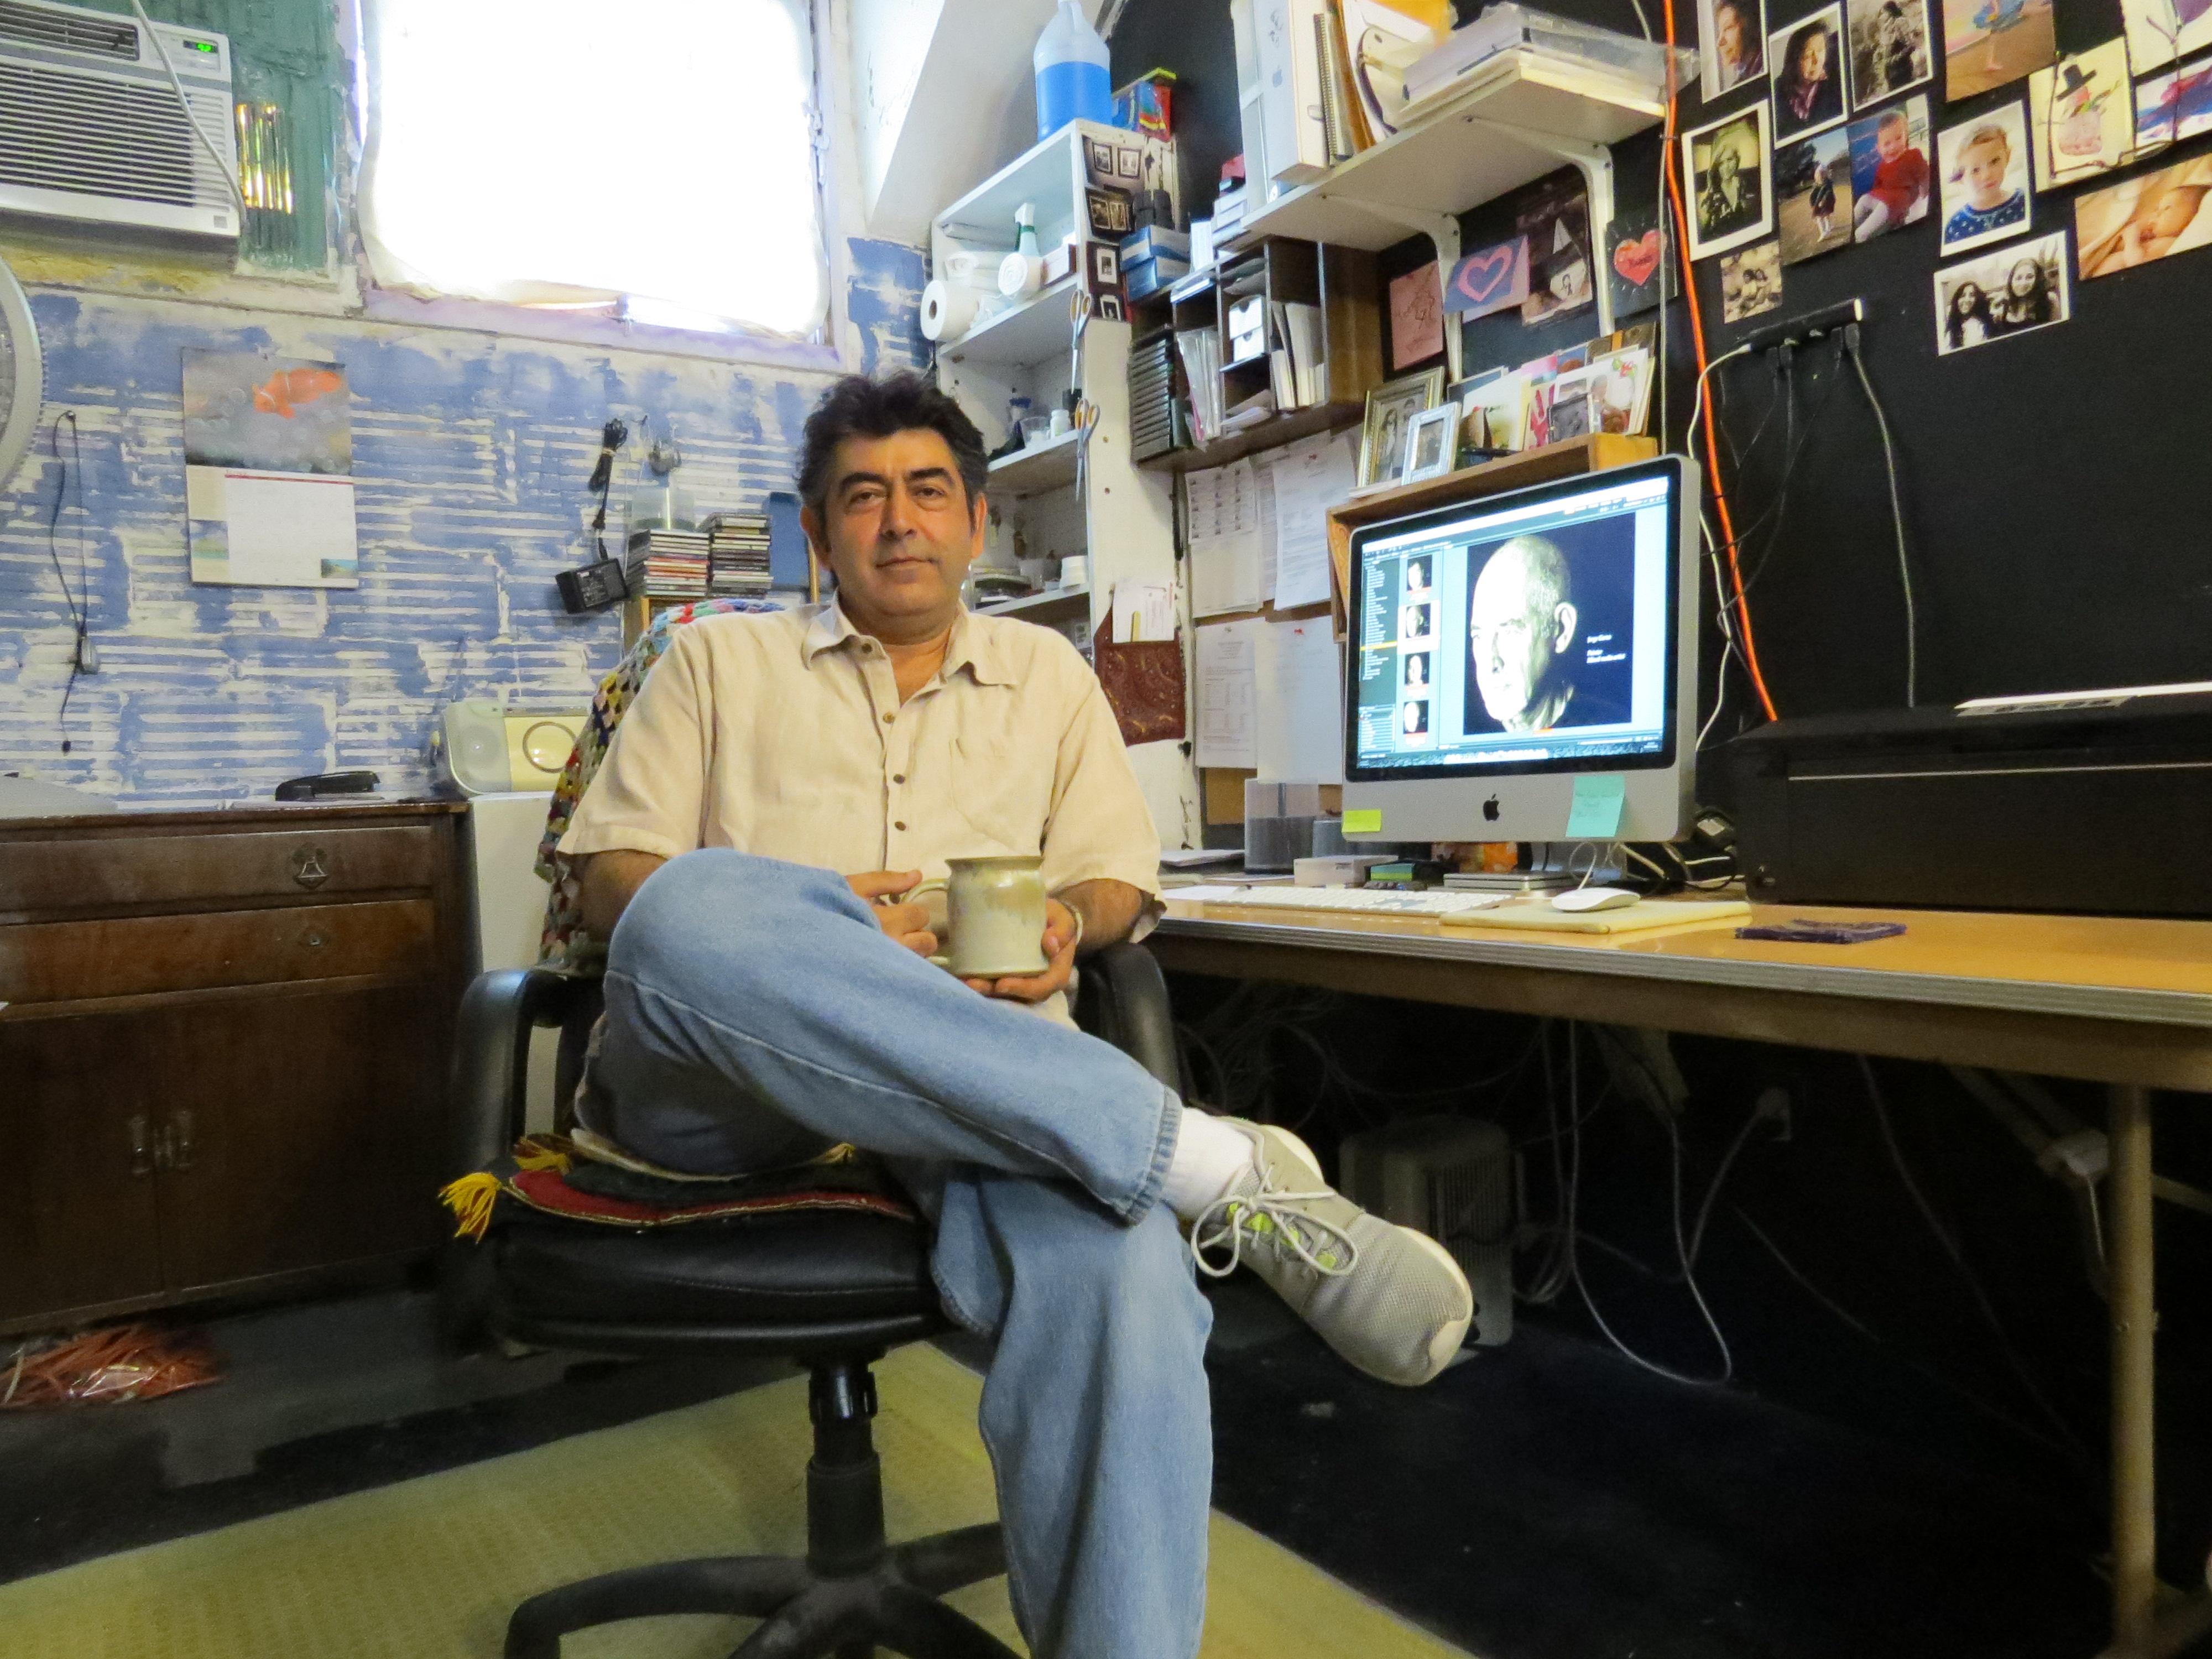 Ramin Samandari in his studio. Photo: David S. Rubin